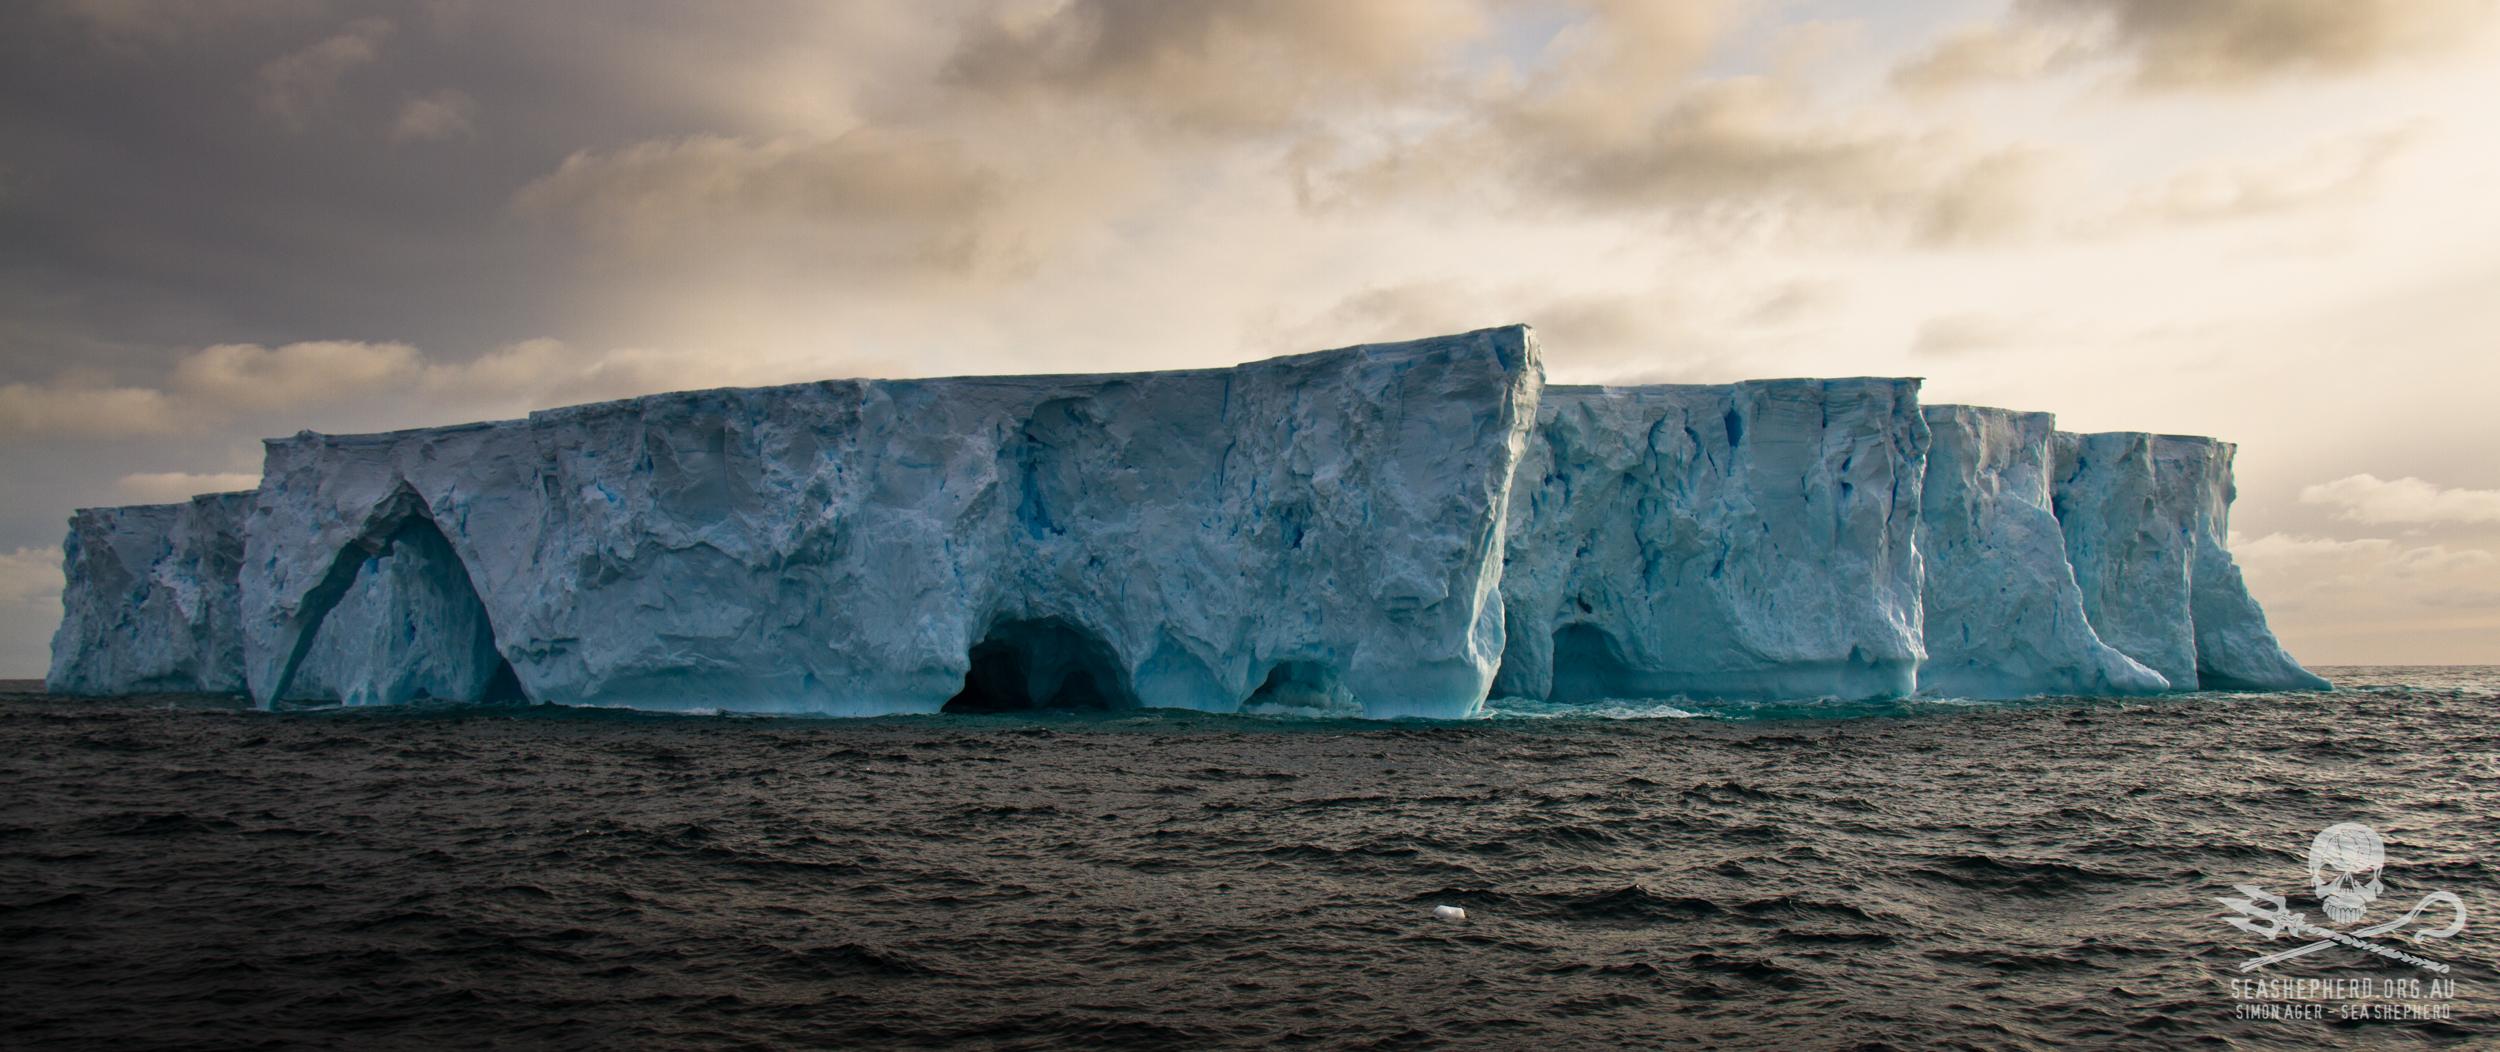 110213_SA_Iceberg_Sunset_Art_002_7835